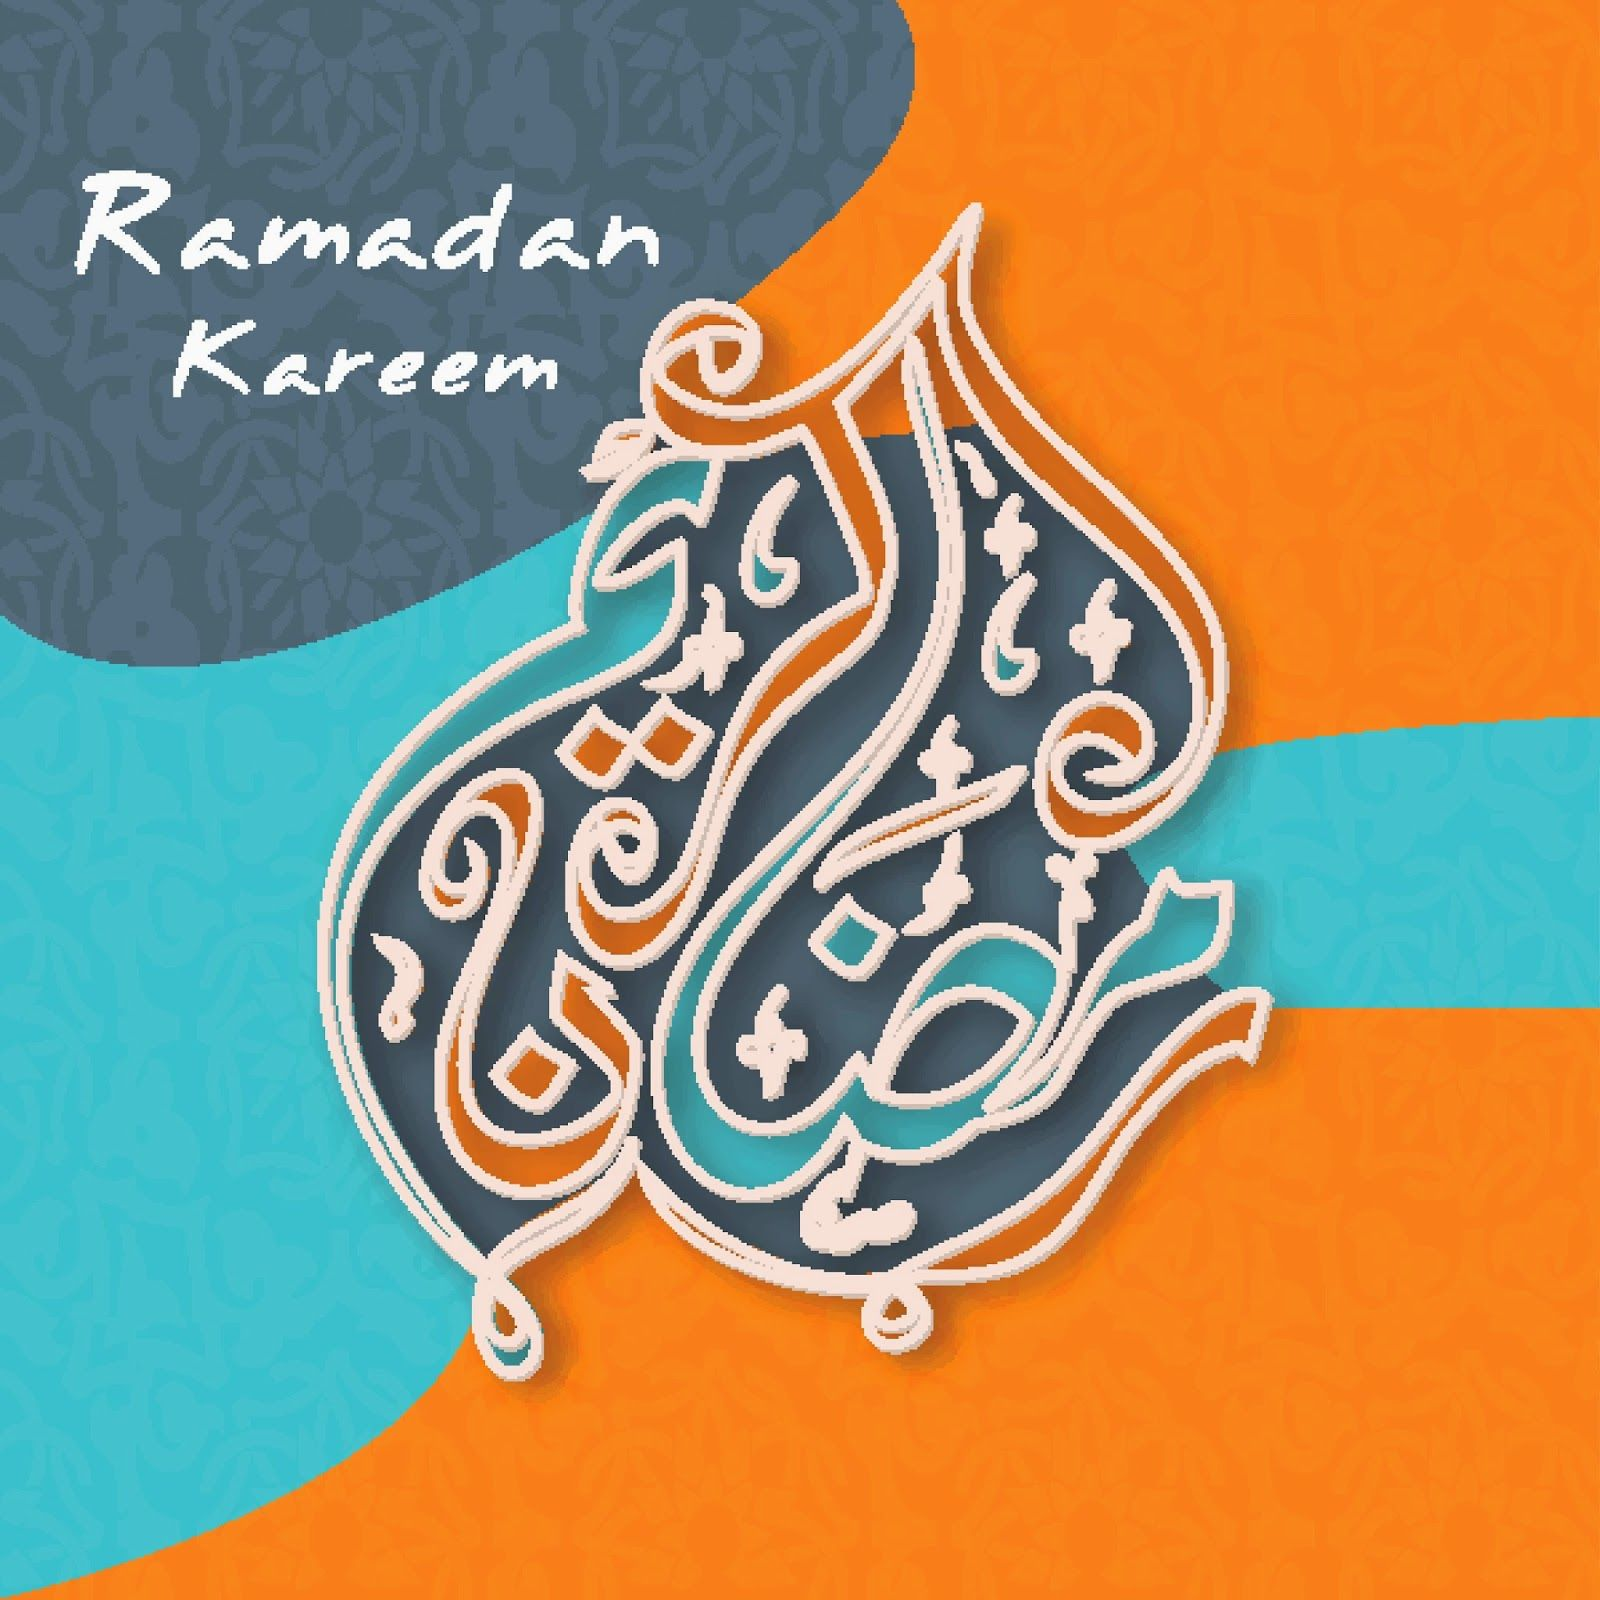 essay about ramadan essay about ramadan of